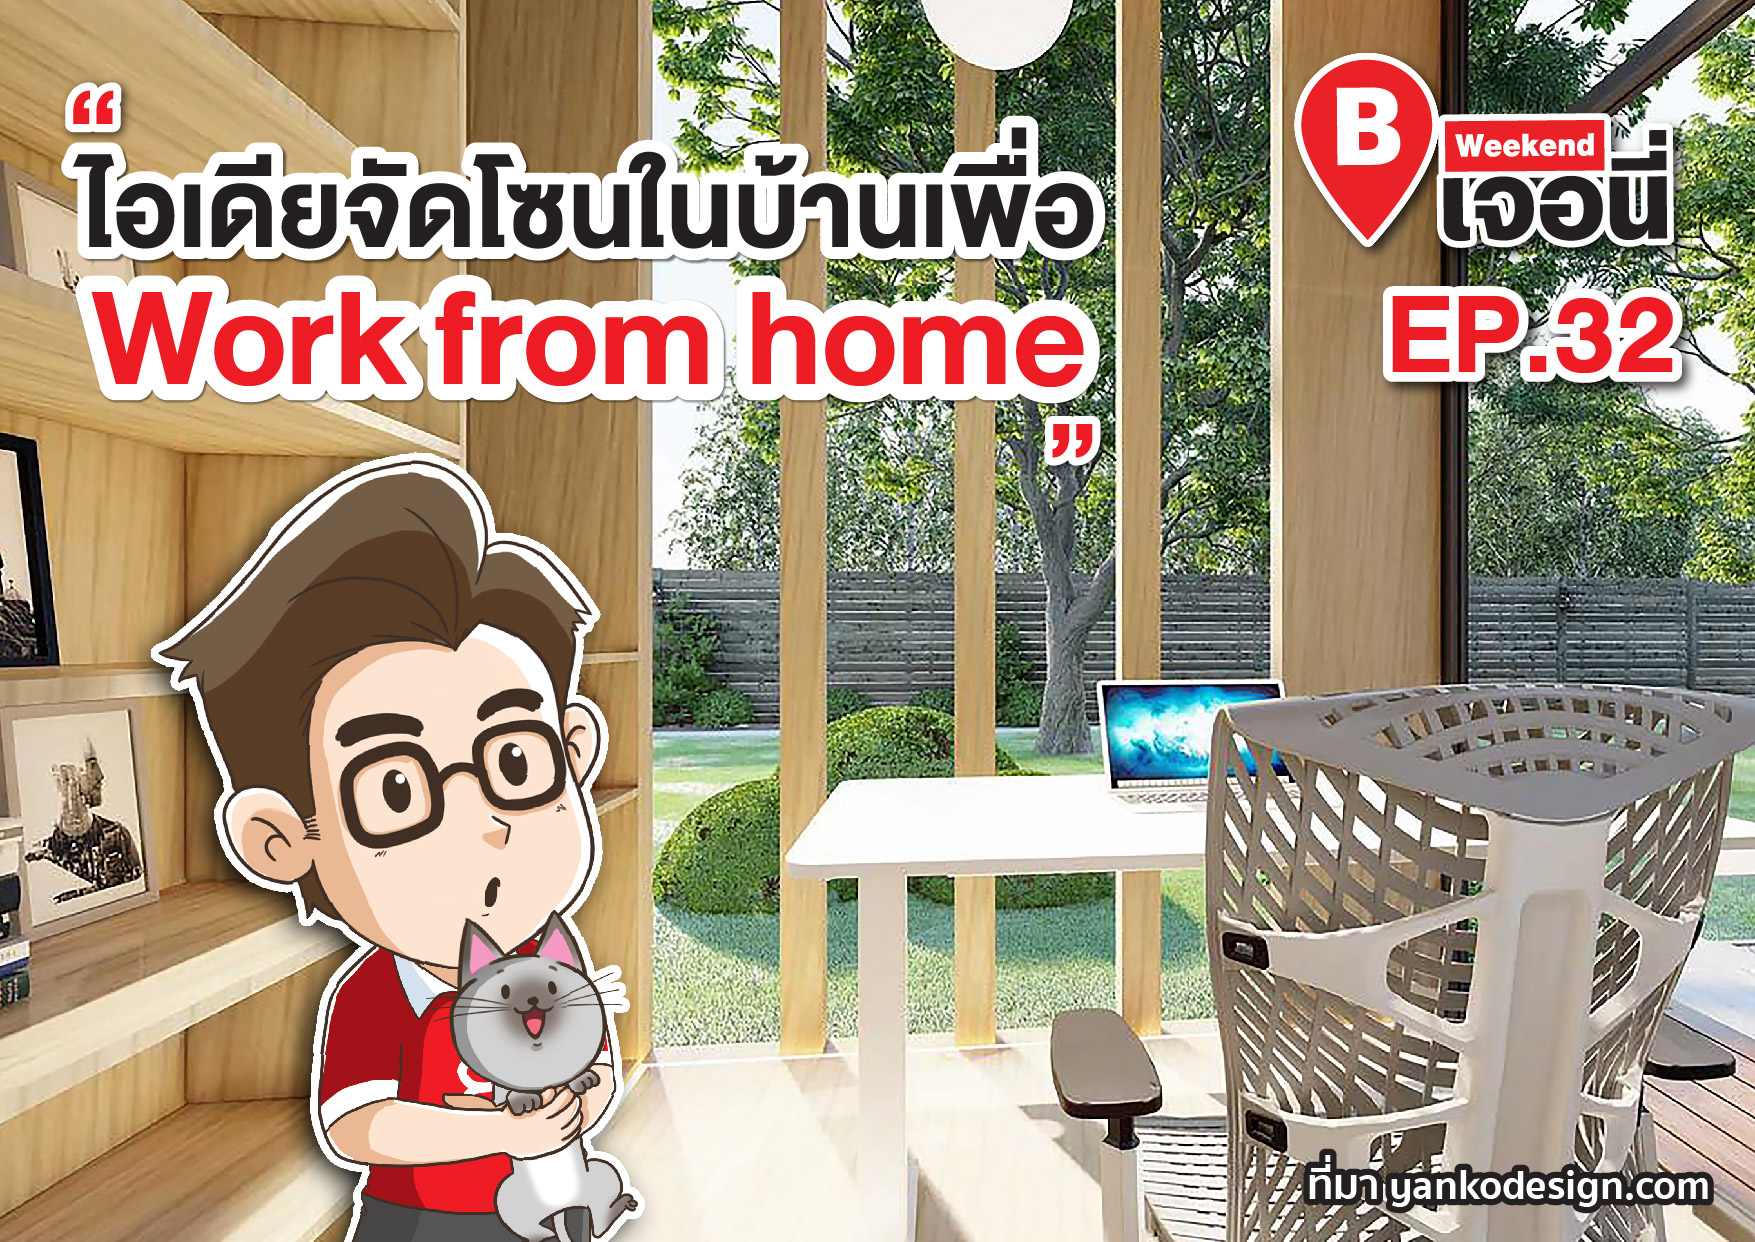 Weekend เจอนี่ - จัดโซนในบ้านเพื่อ Work from Home